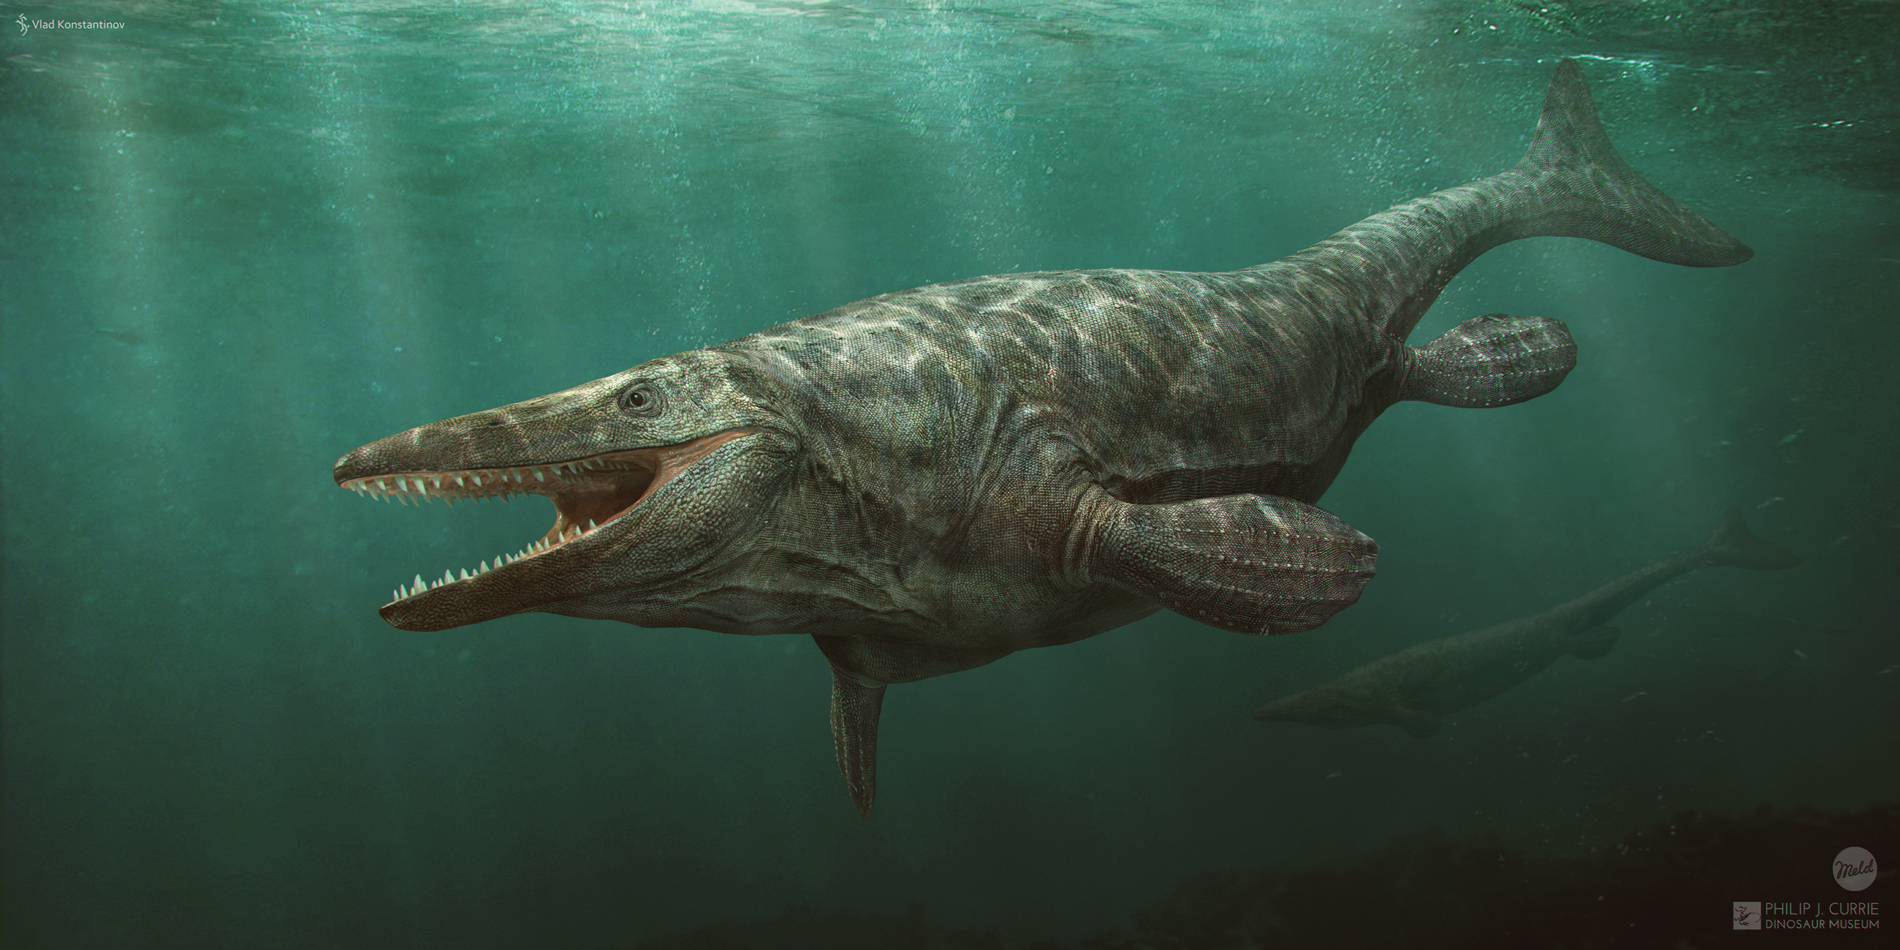 Tylosaurus pembinensis